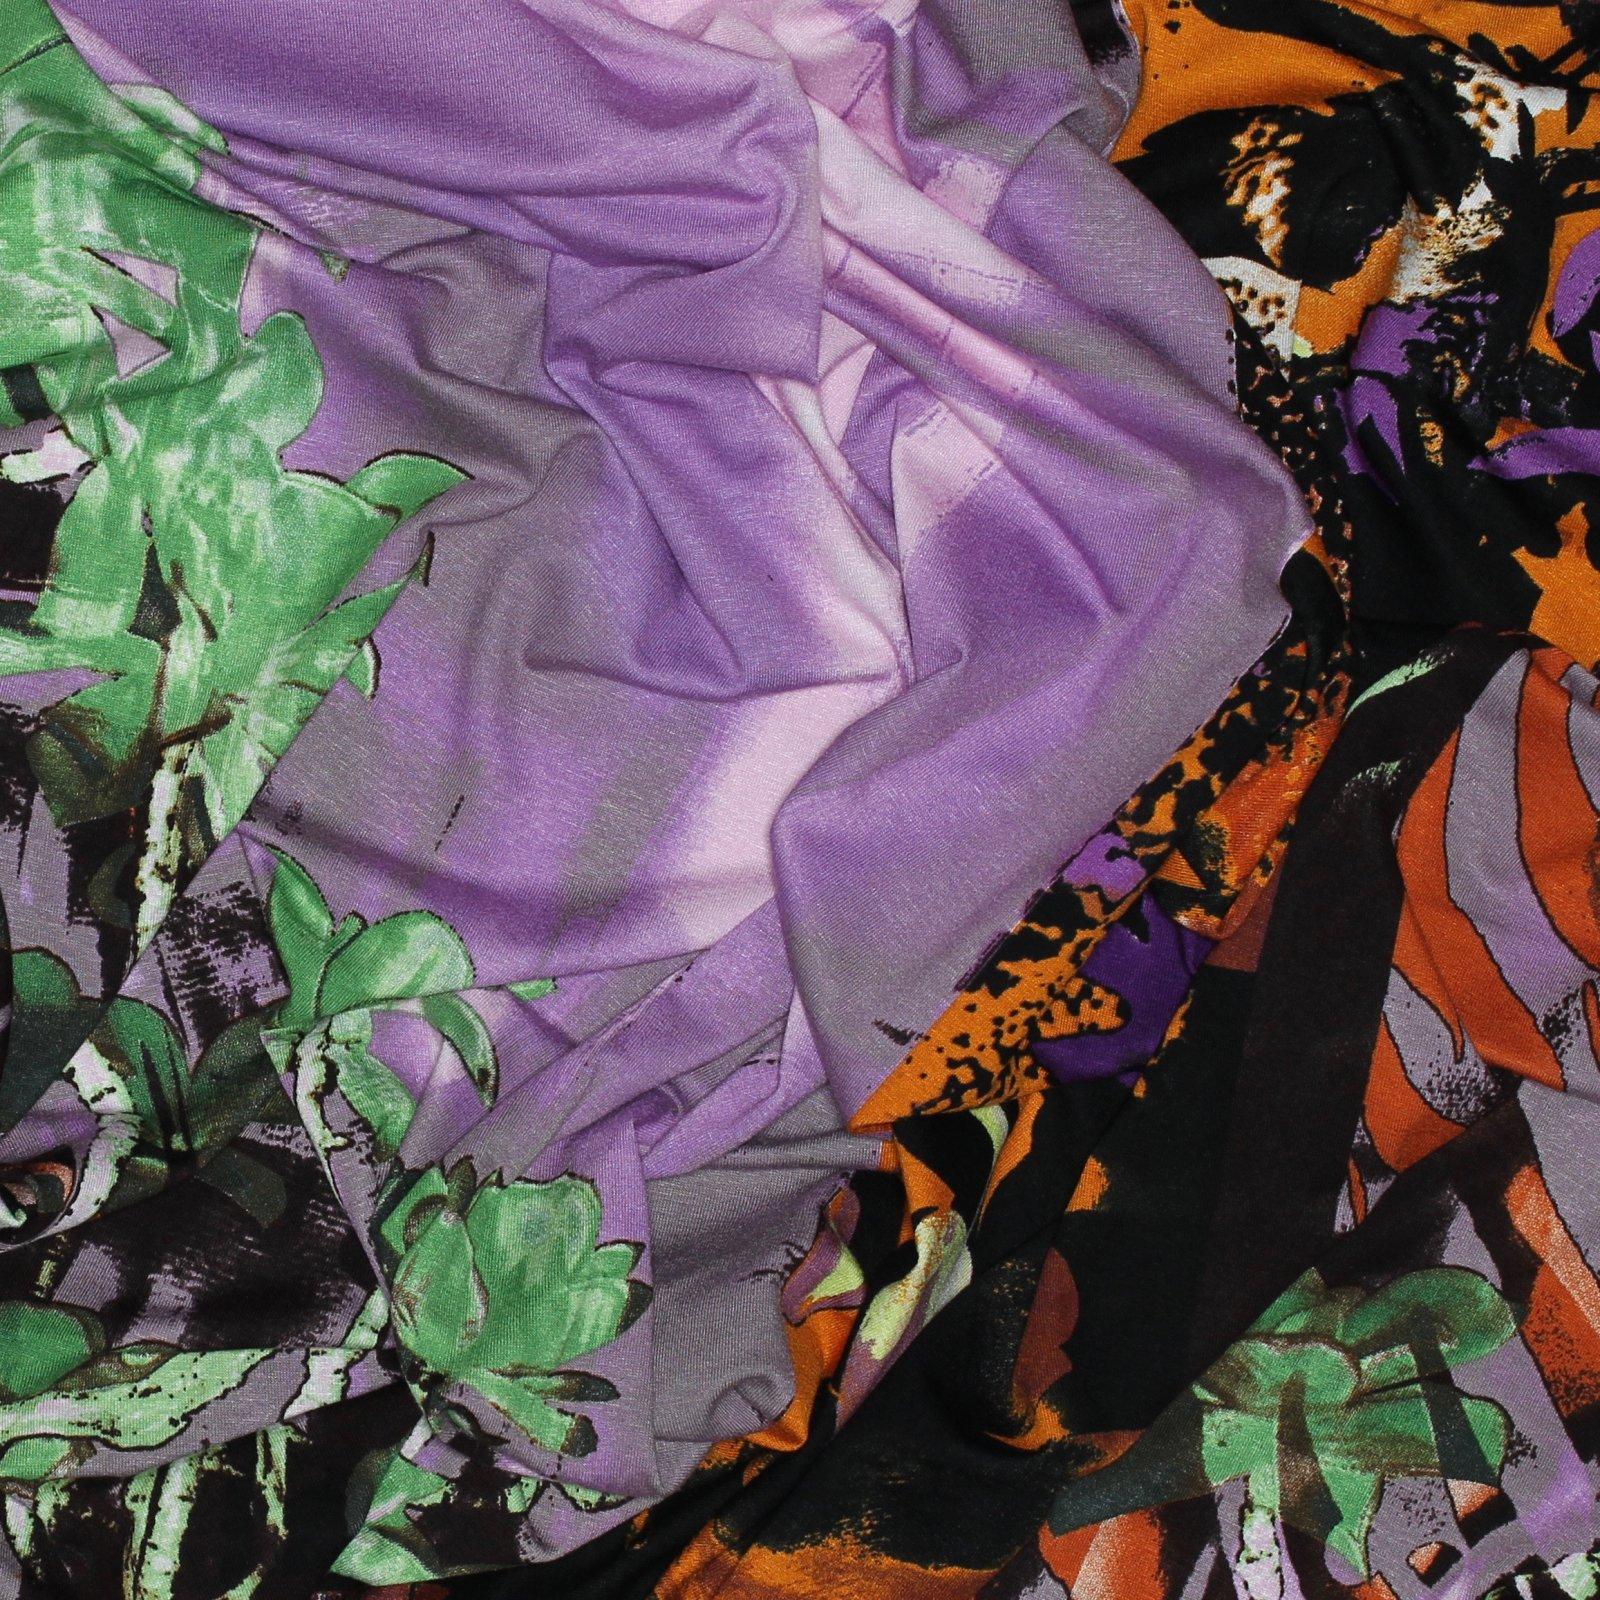 Purple/Orange/Brown Panel Rayon/Lycra Italian Knit